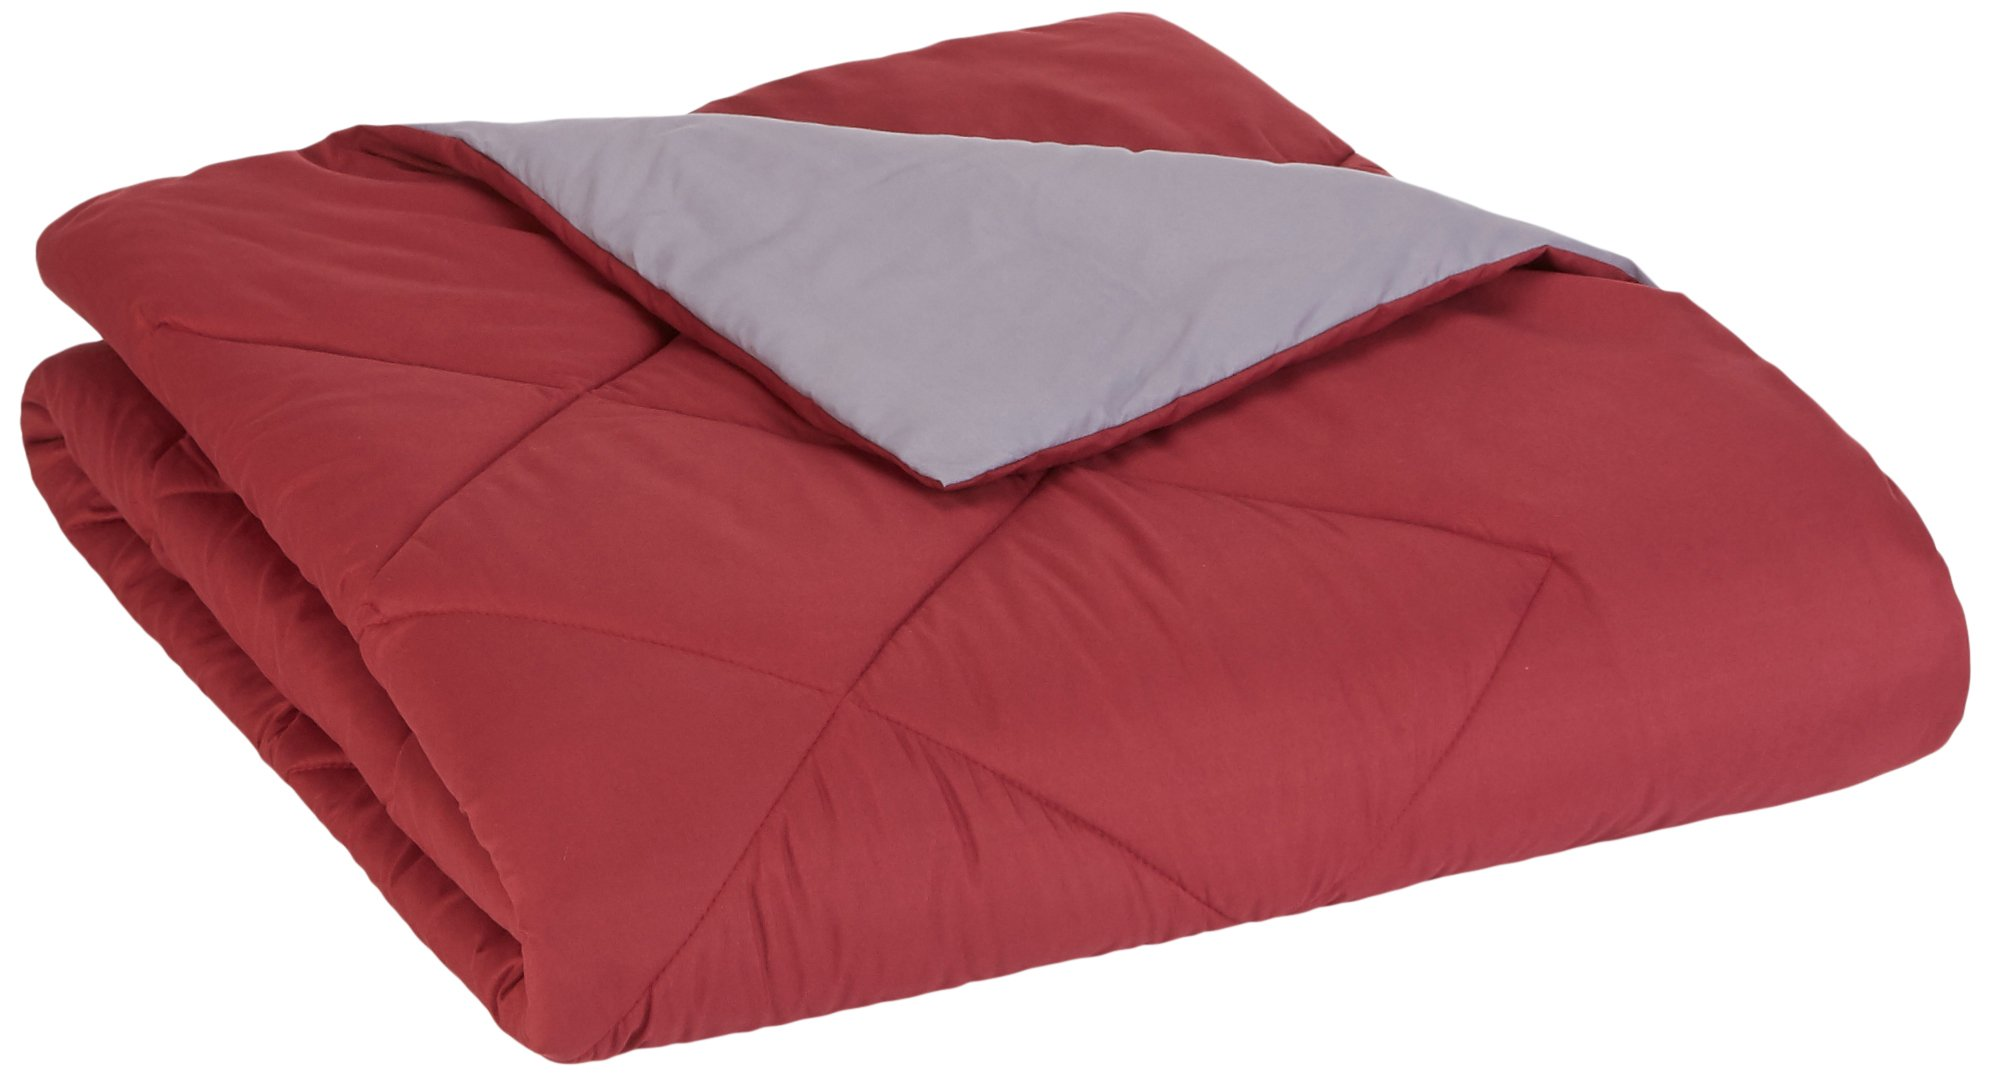 AmazonBasics Reversible Microfiber Comforter - Twin/Twin XL, Burgundy